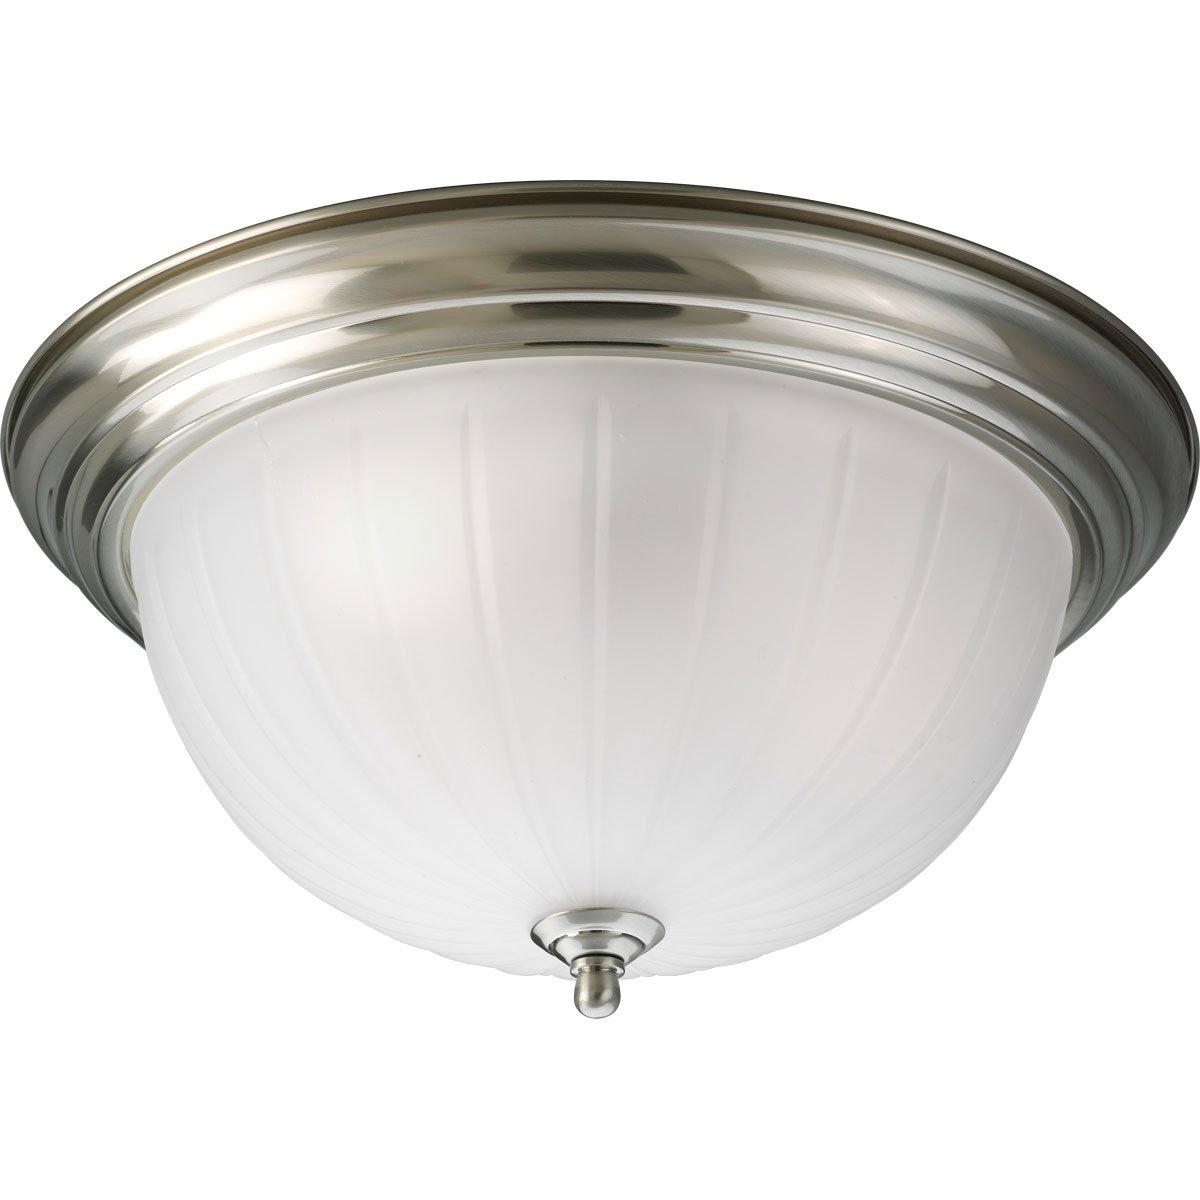 bel brushed chrome modern loading halogen art air artcraft nickel ceilings light ceiling zoom